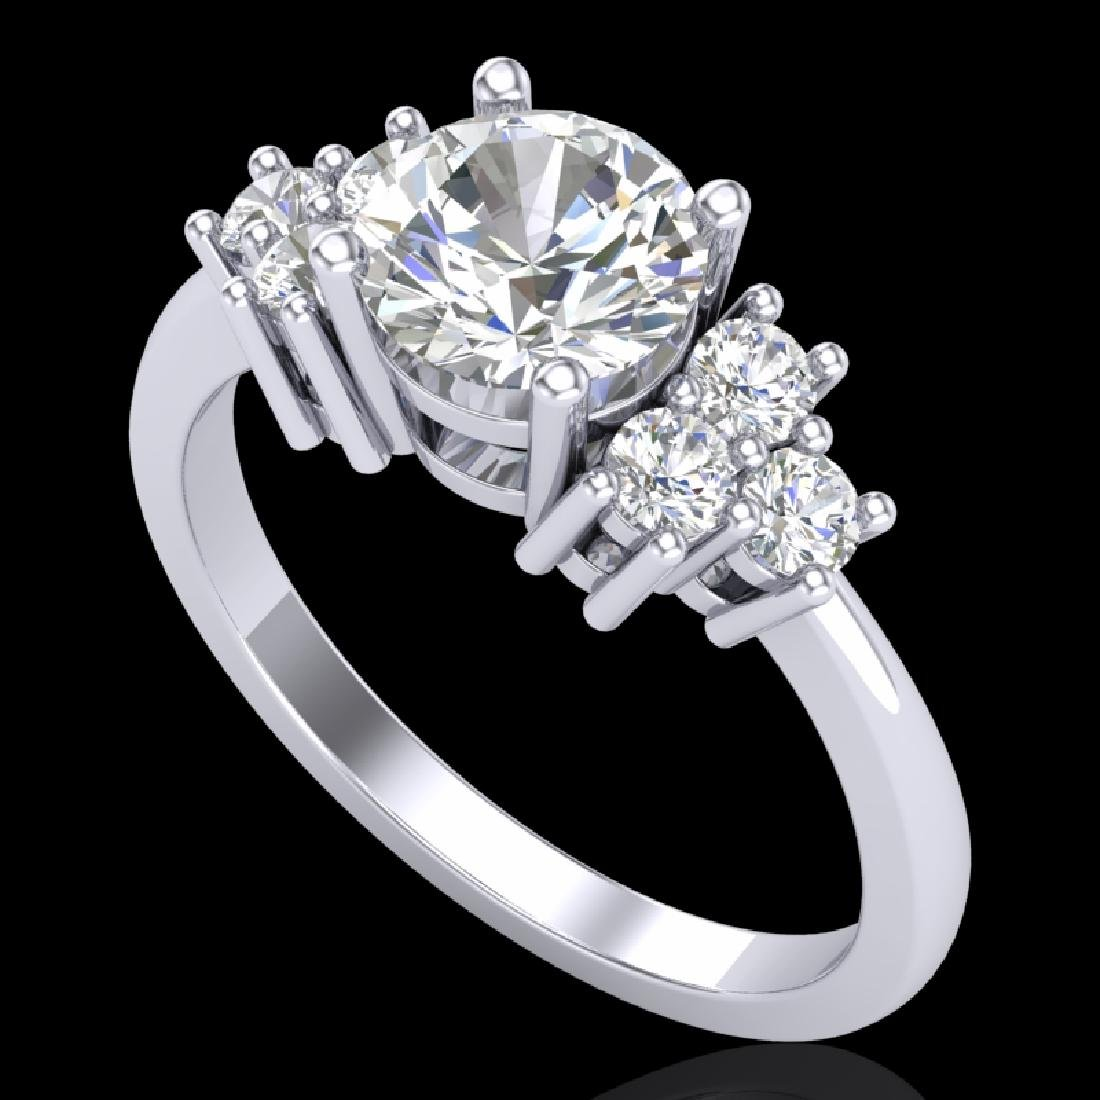 1.5 CTW VS/SI Diamond Solitaire Ring 18K White Gold -